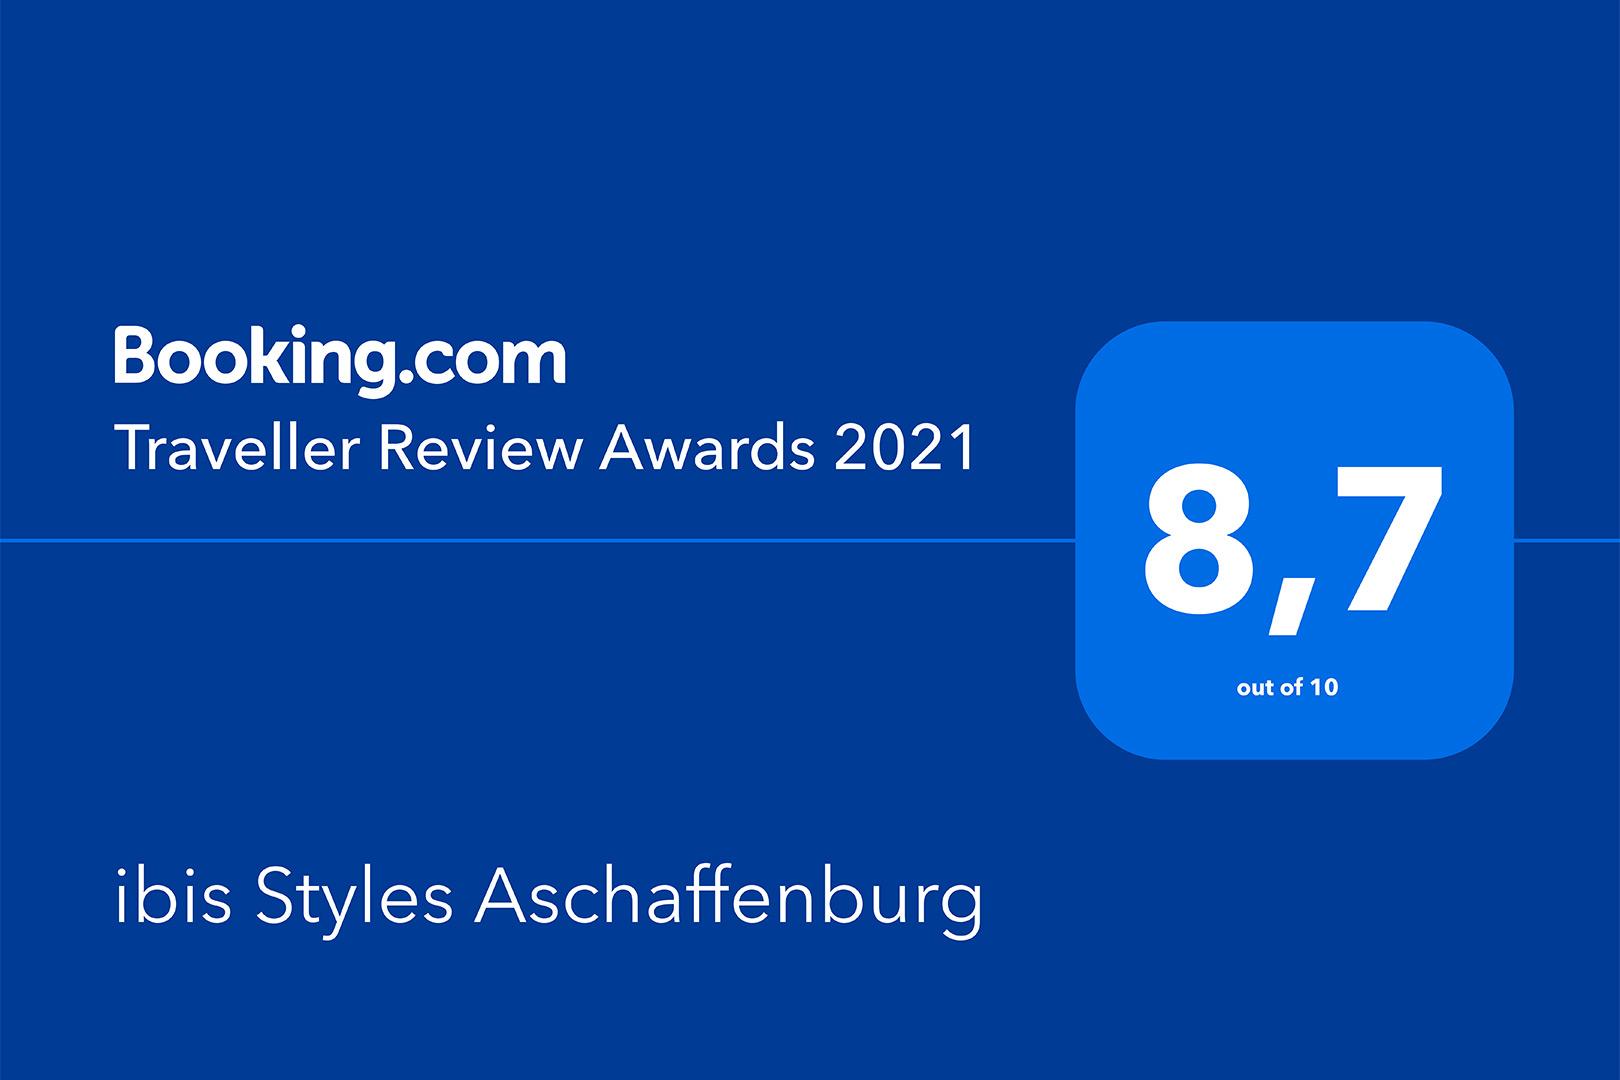 ibis Styles Aschaffenburg - Traveller Review Award 2021